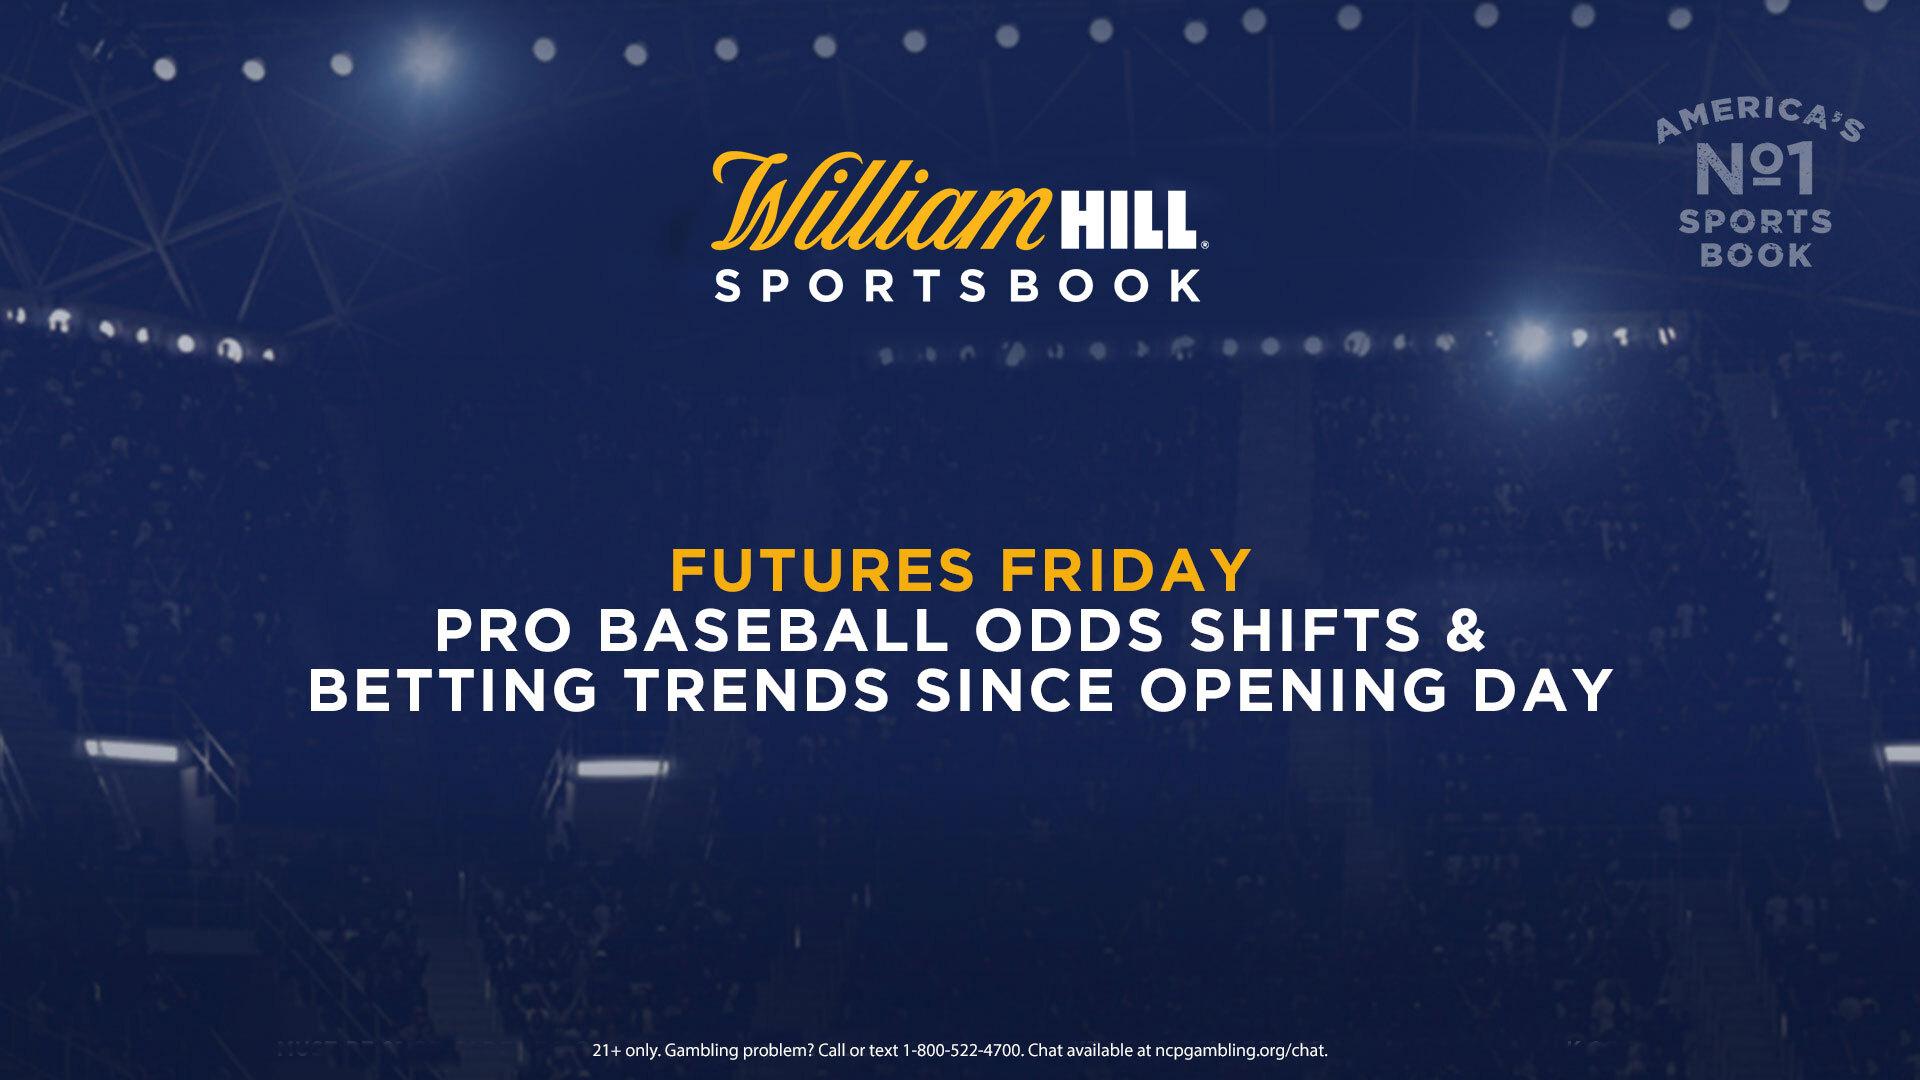 Mlb betting trends 2021 texas a&m arkansas 2021 betting line